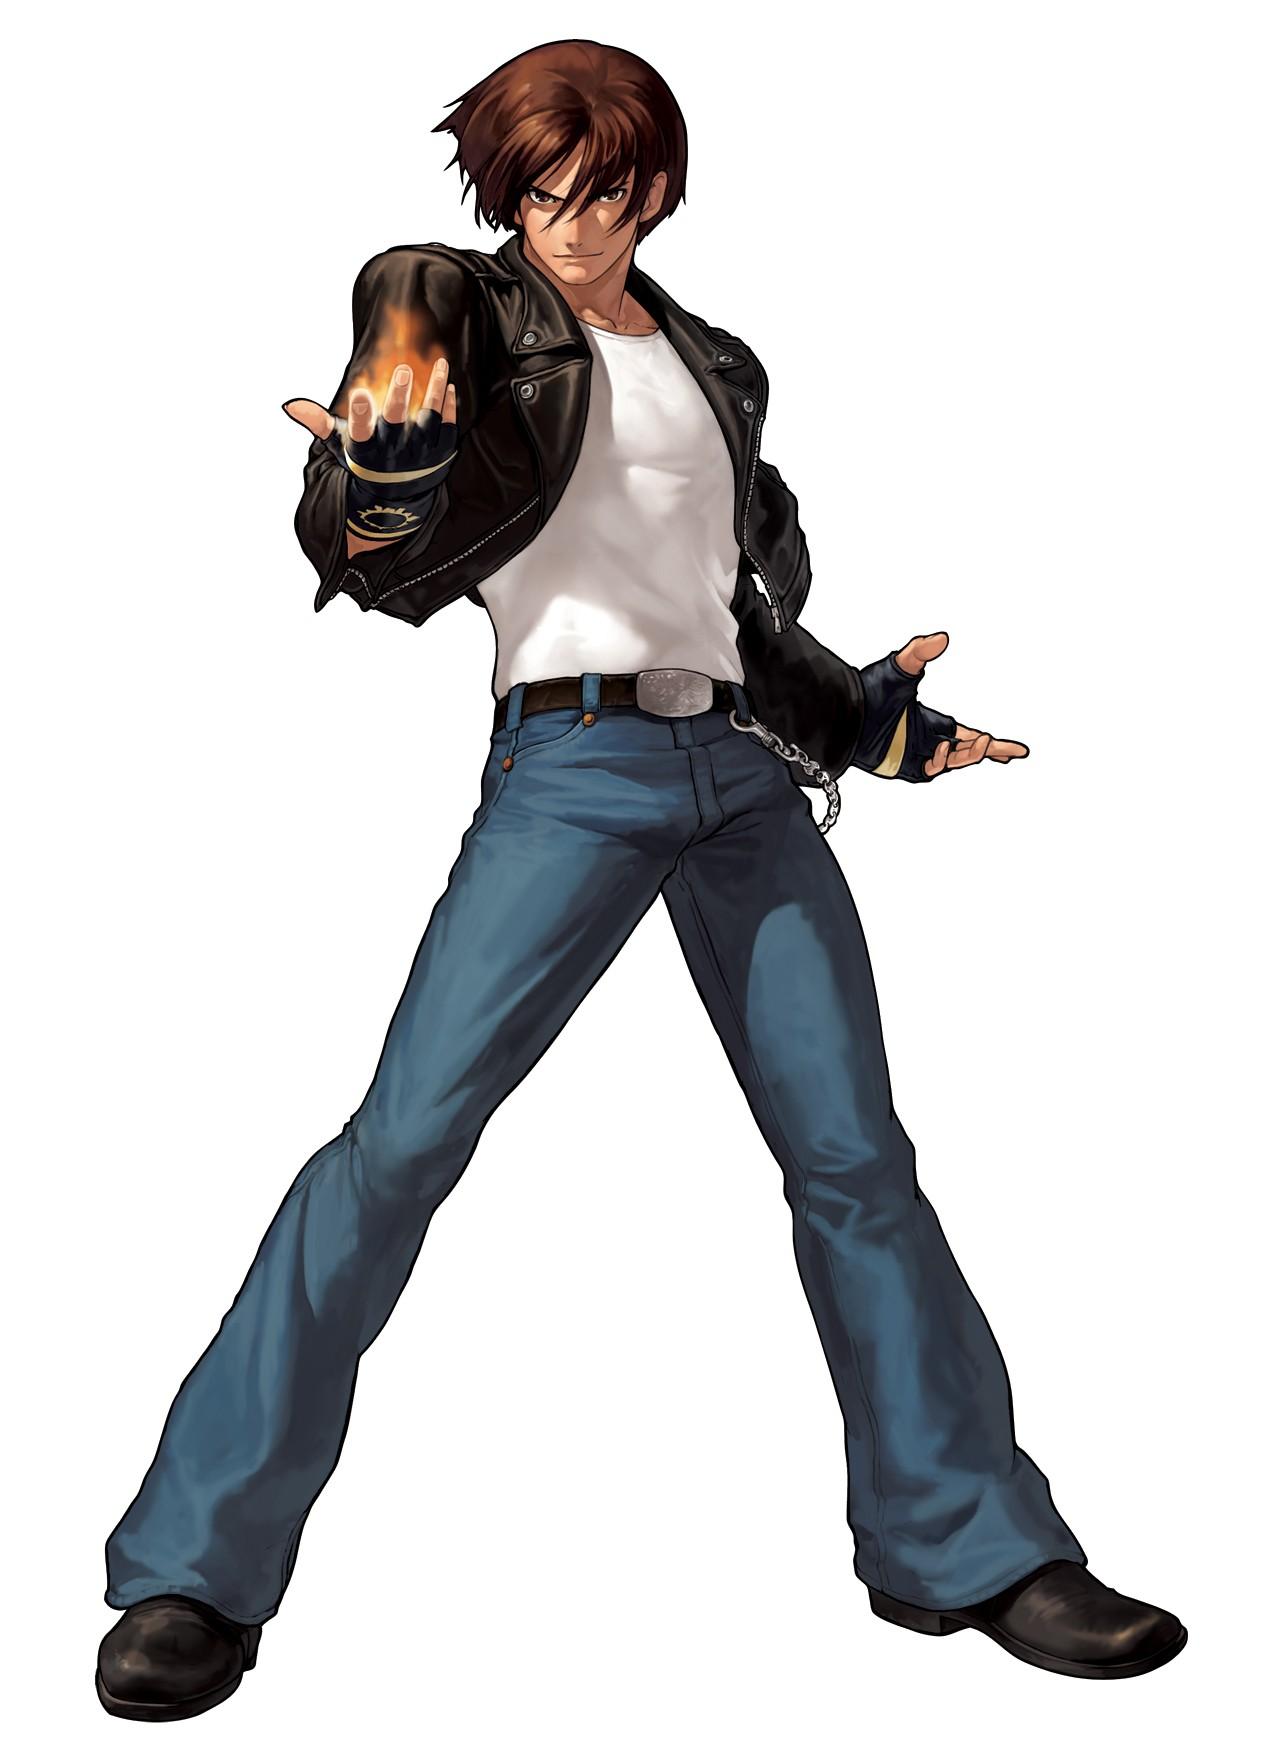 Anime Characters Leather Jacket : Kusanagi kyo king of fighters image  zerochan